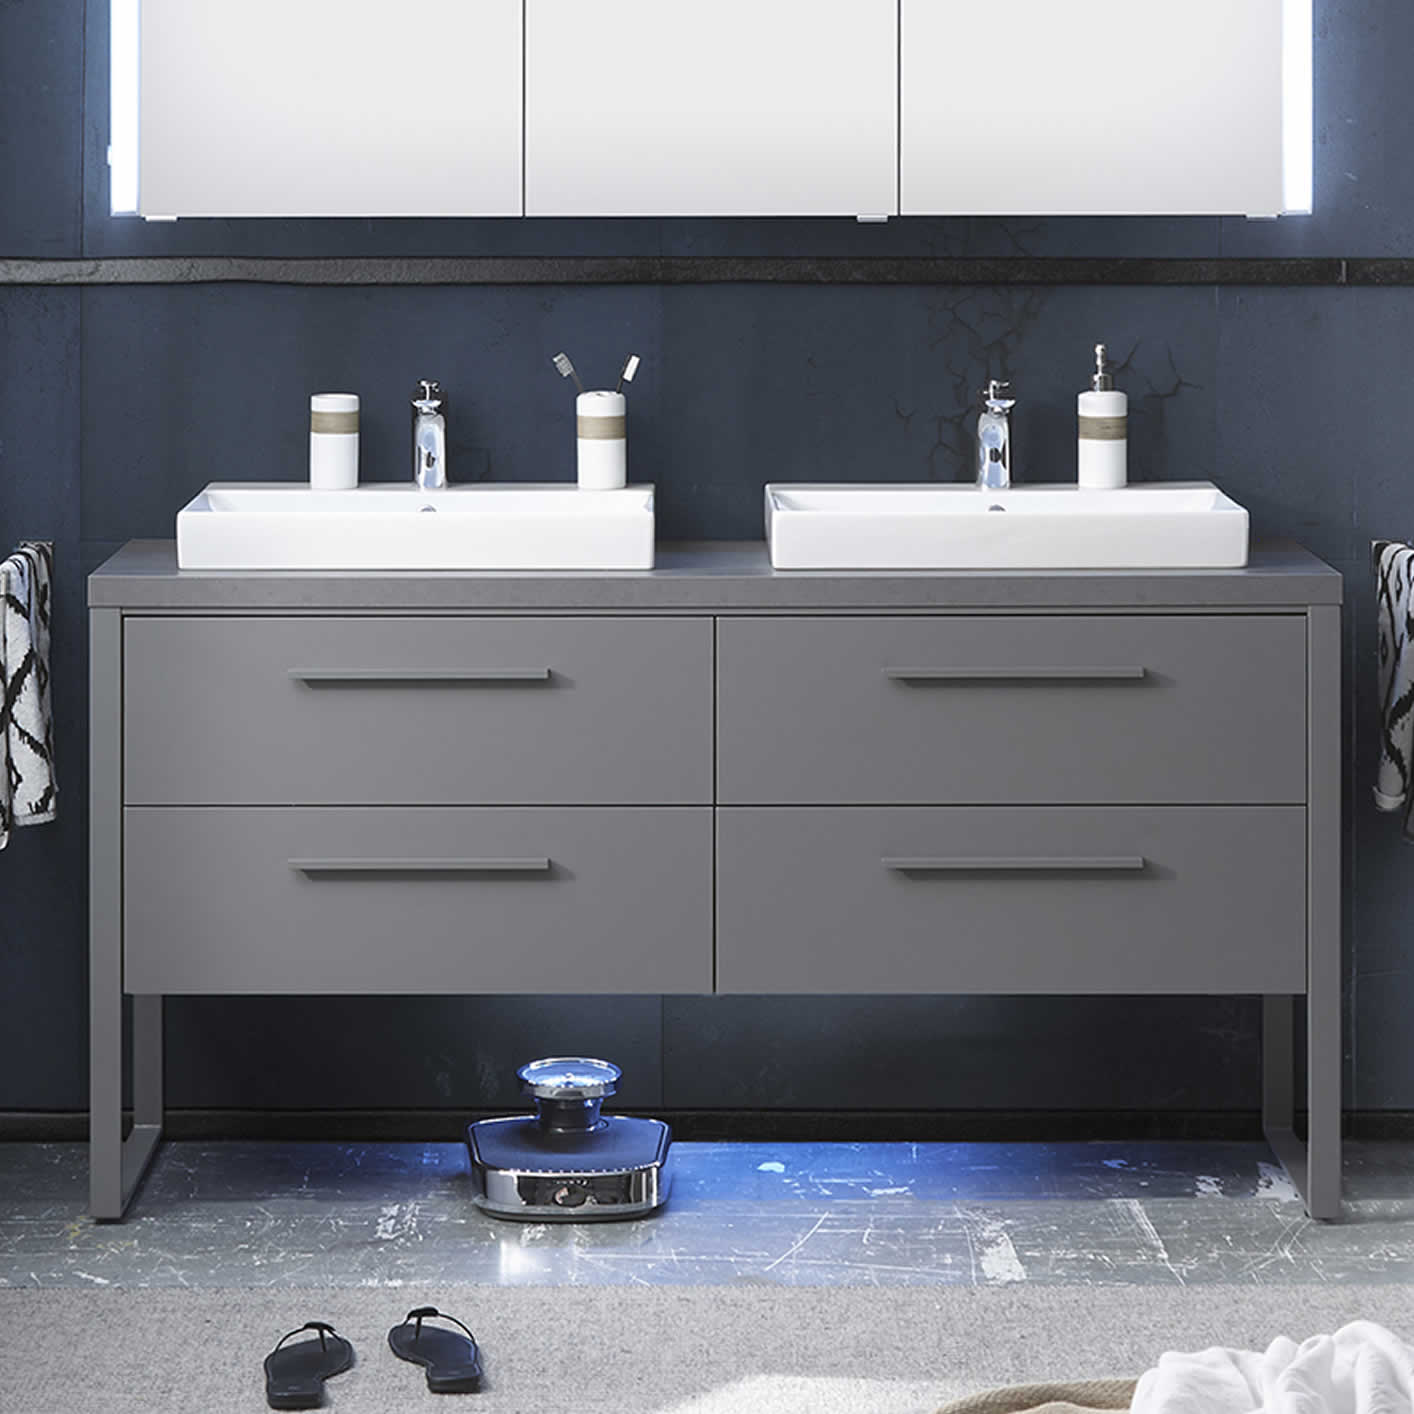 pelipal solitaire 9025 waschtisch set 160 cm breite impulsbad. Black Bedroom Furniture Sets. Home Design Ideas